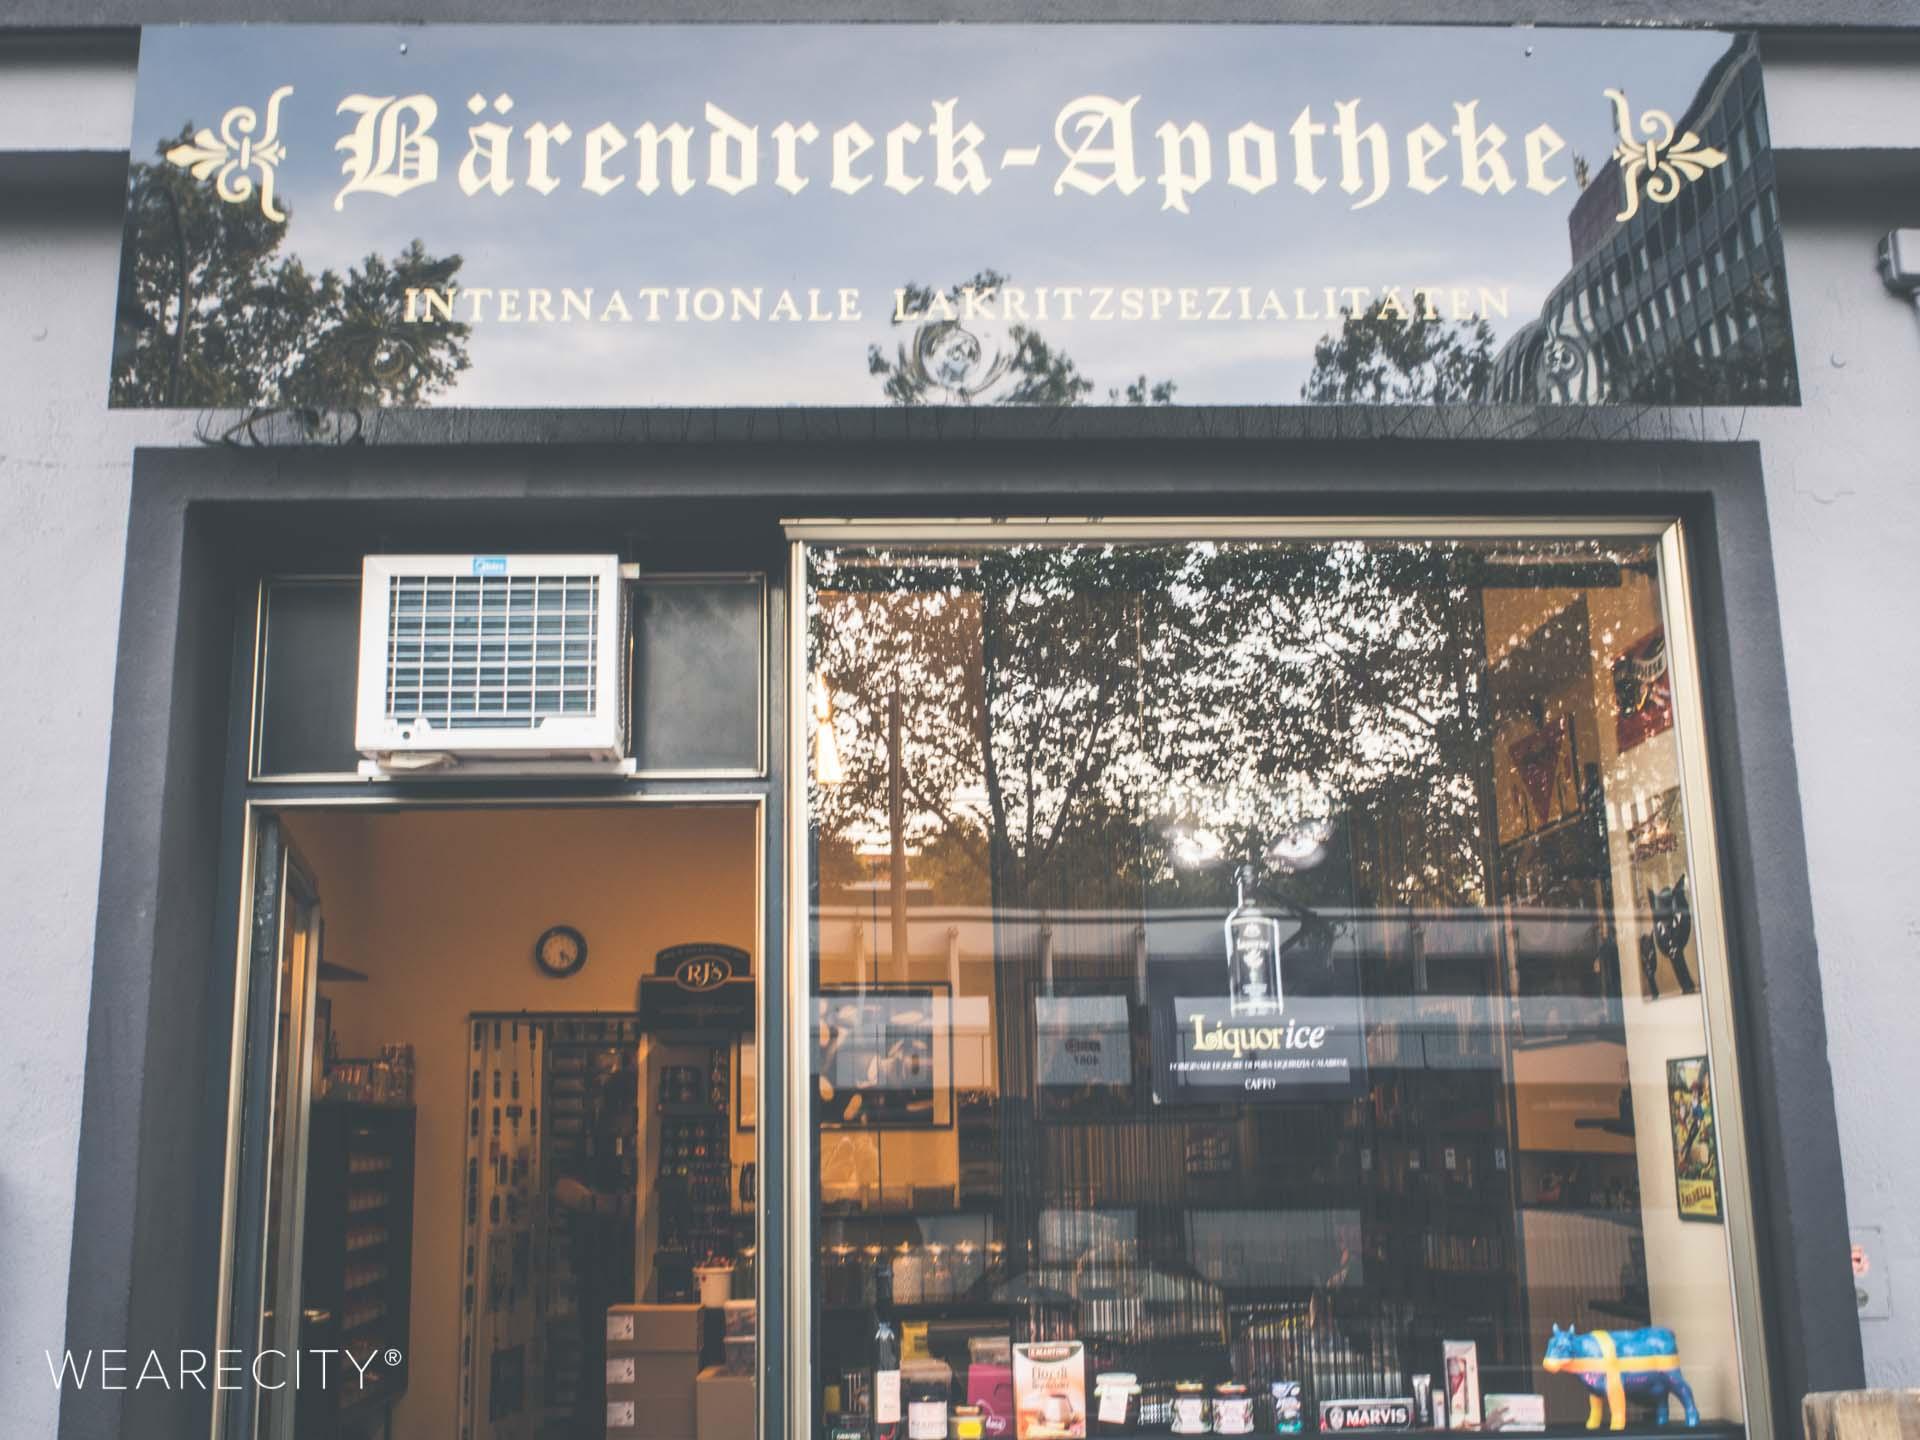 Bärendreck-Apotheke | FOTO: wearecity.de